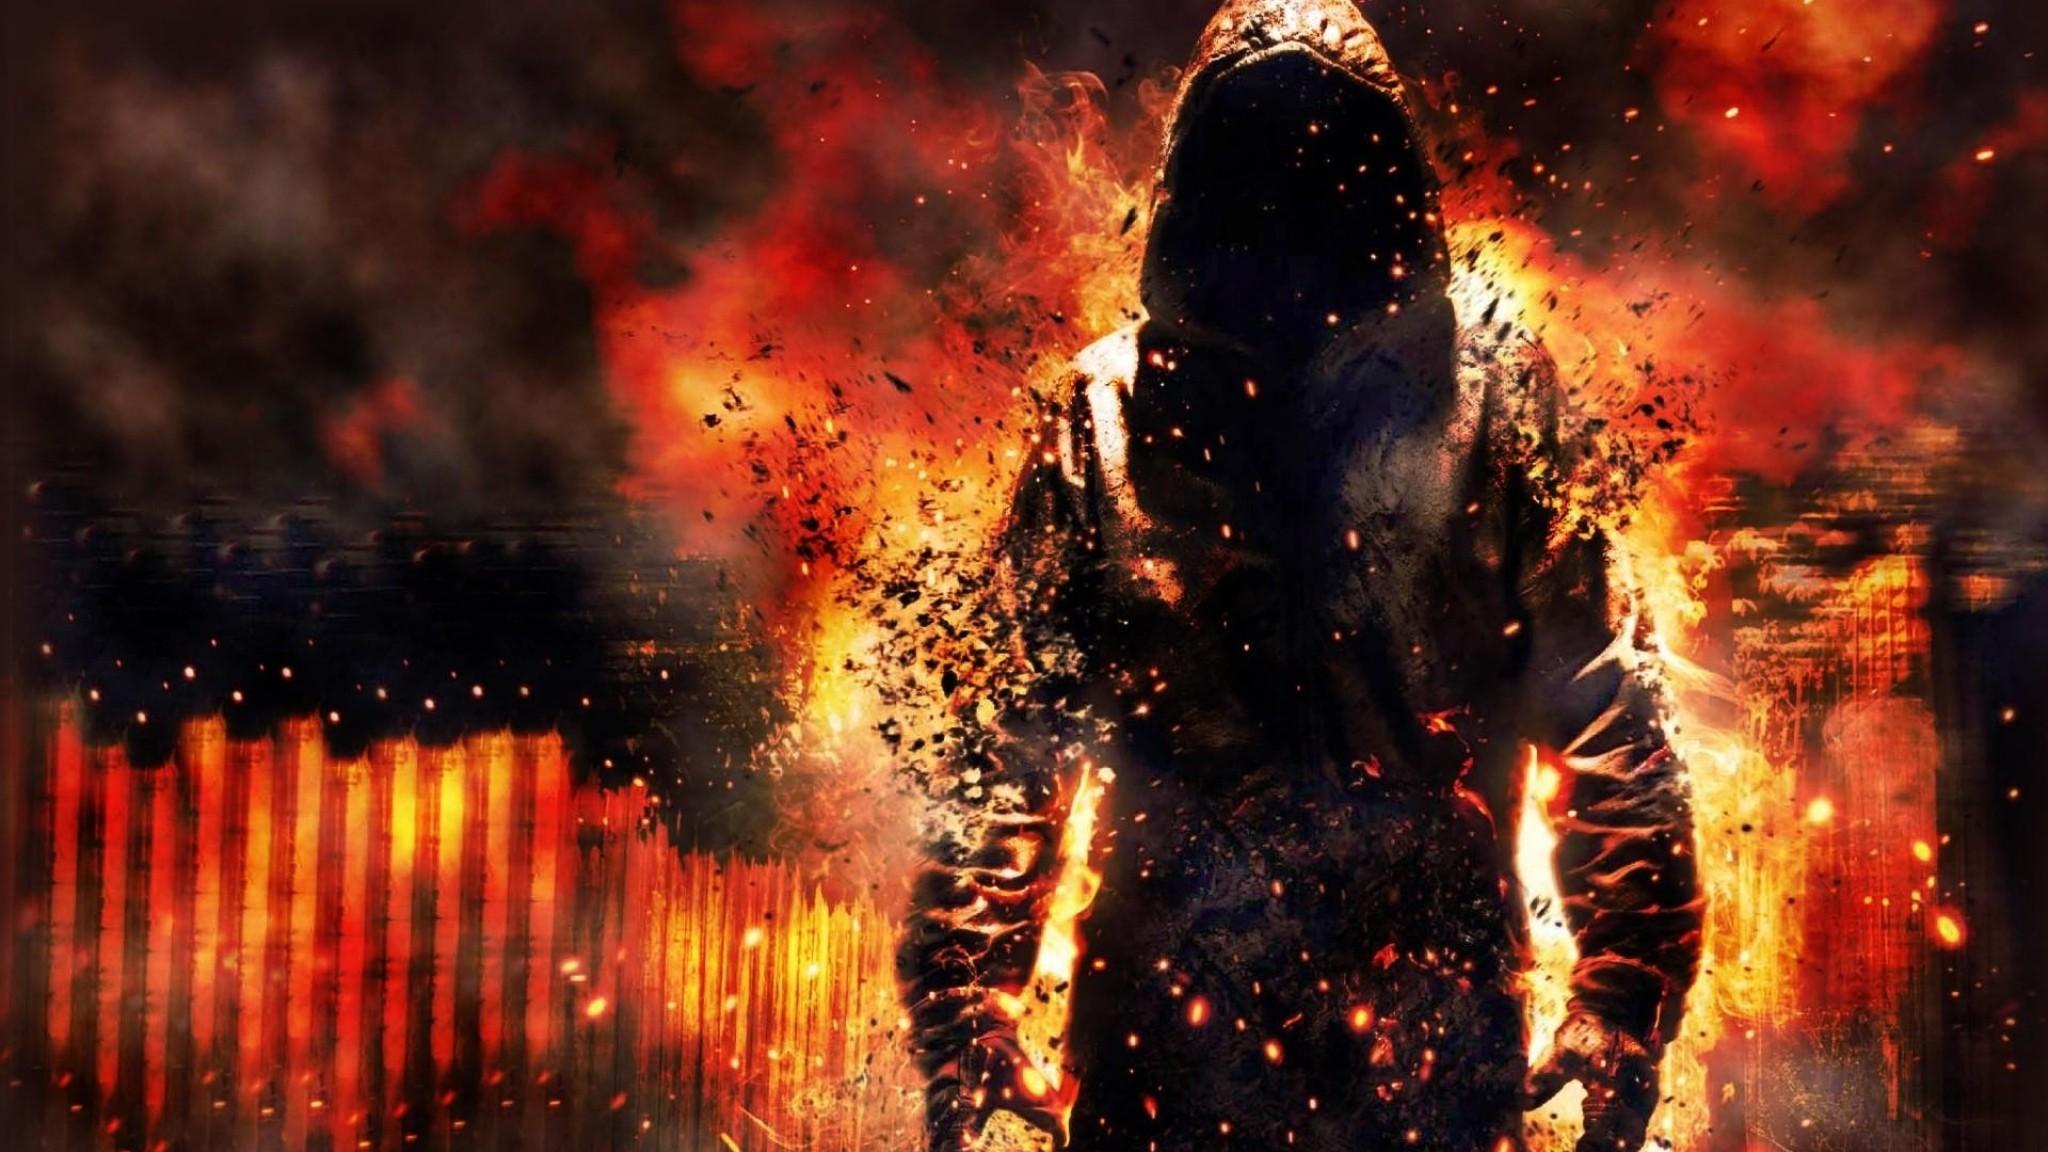 2048x1152 Preview Wallpaper Fire, Destruction, Debris, Cape, Biggin, Man  2048x1152